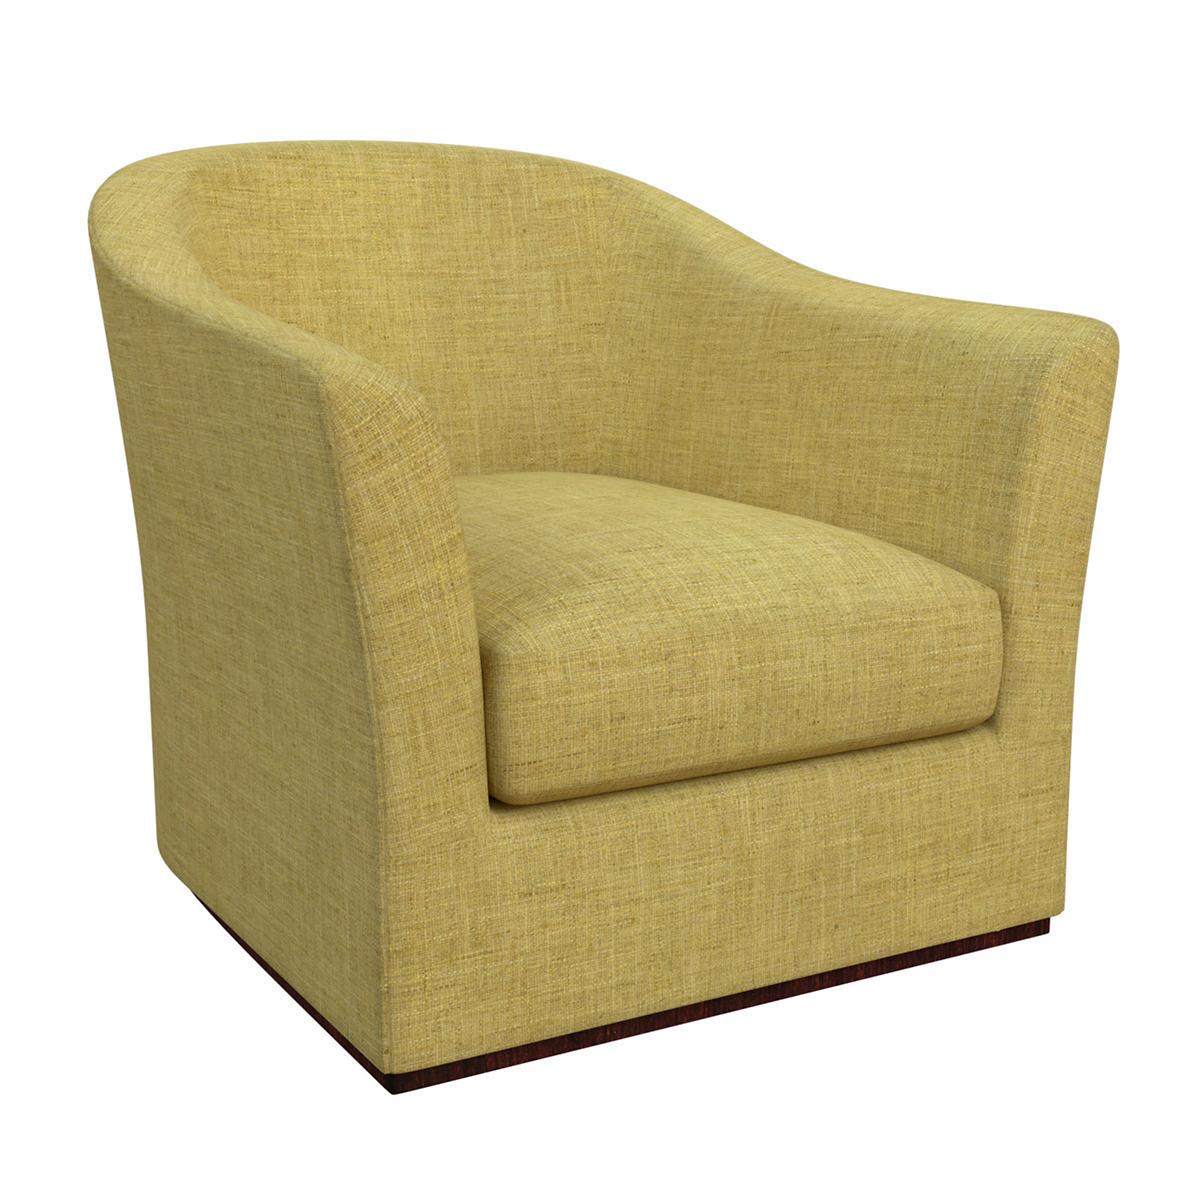 Canvasuede Citrus Thunderbird Chair